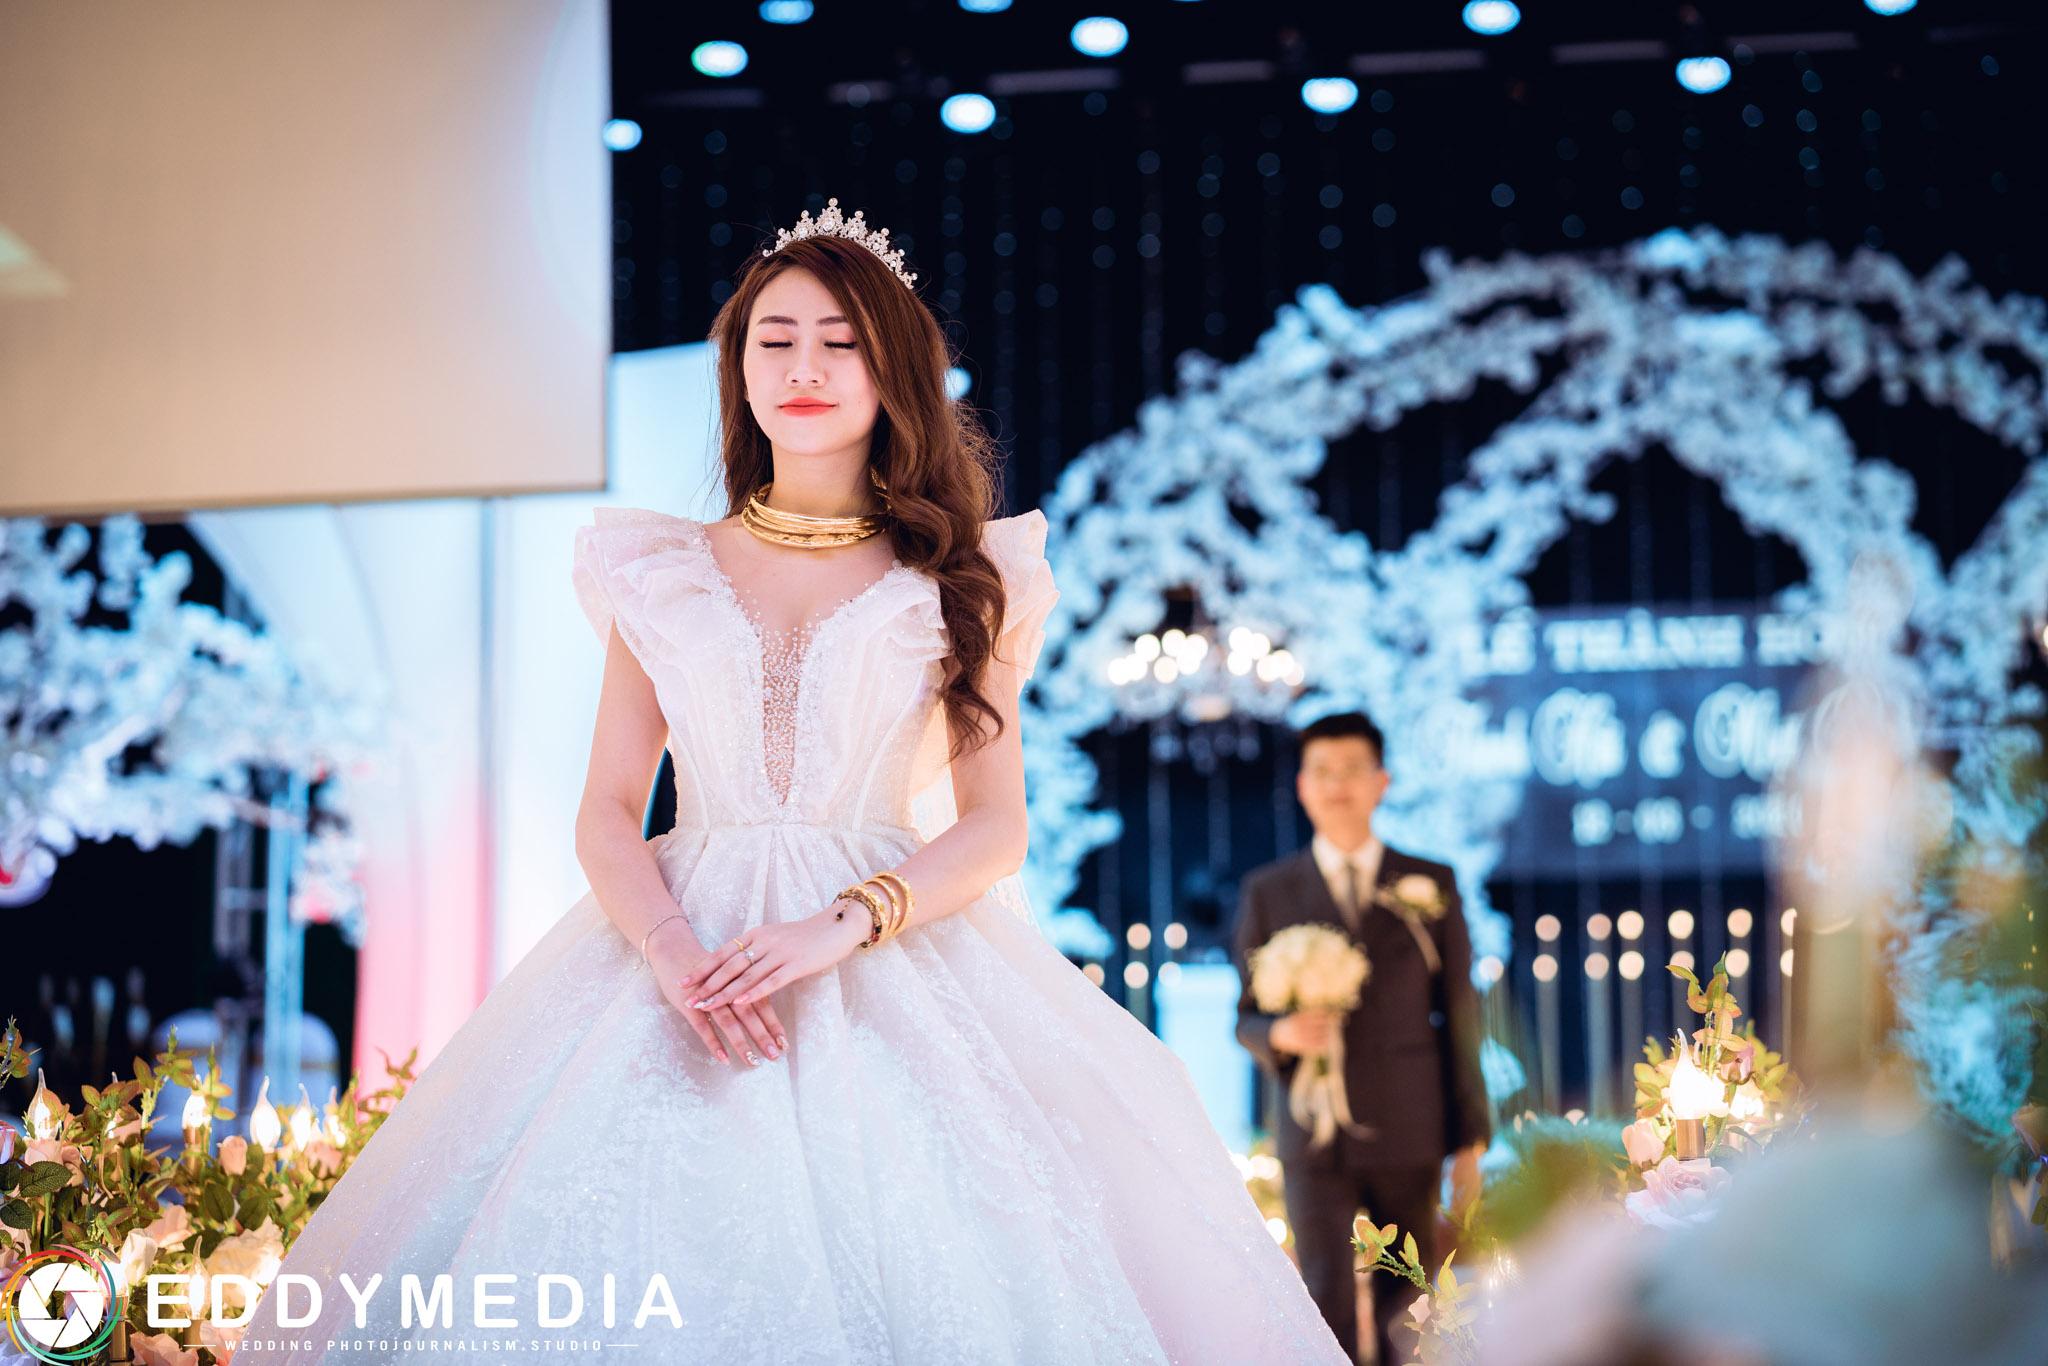 ThanhHai NhatAnh ViHoangNamDinh EddyMedia 55 lấy vợ giàu